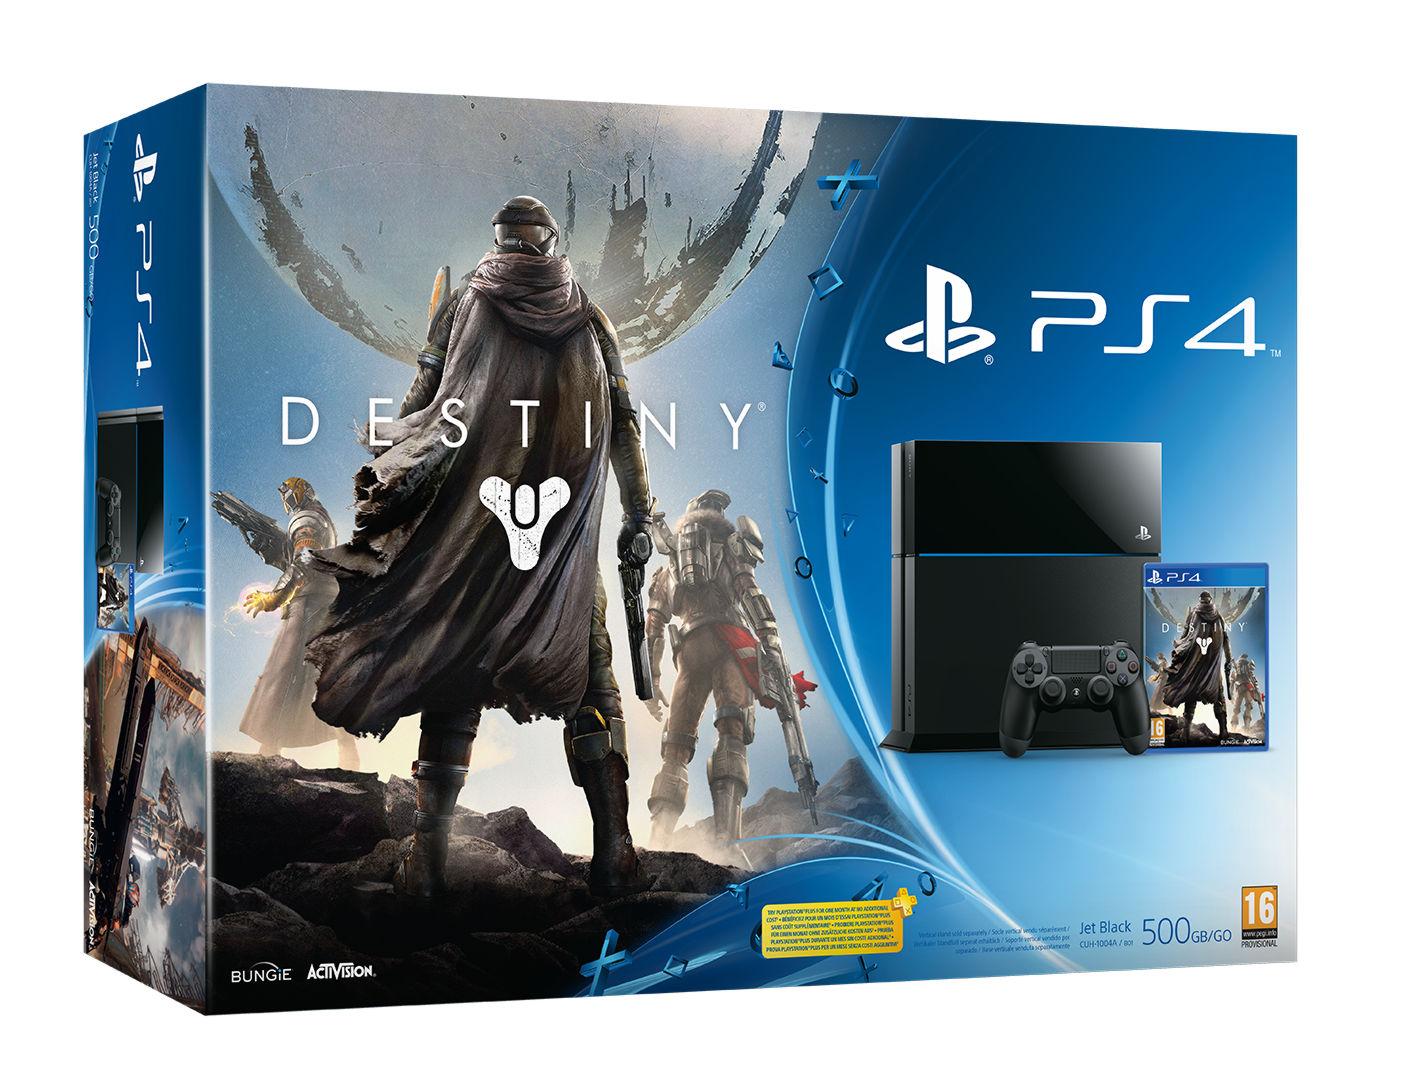 PlayStation 4 500 Gb (CUH-1008A/B01) + игра «Destiny»